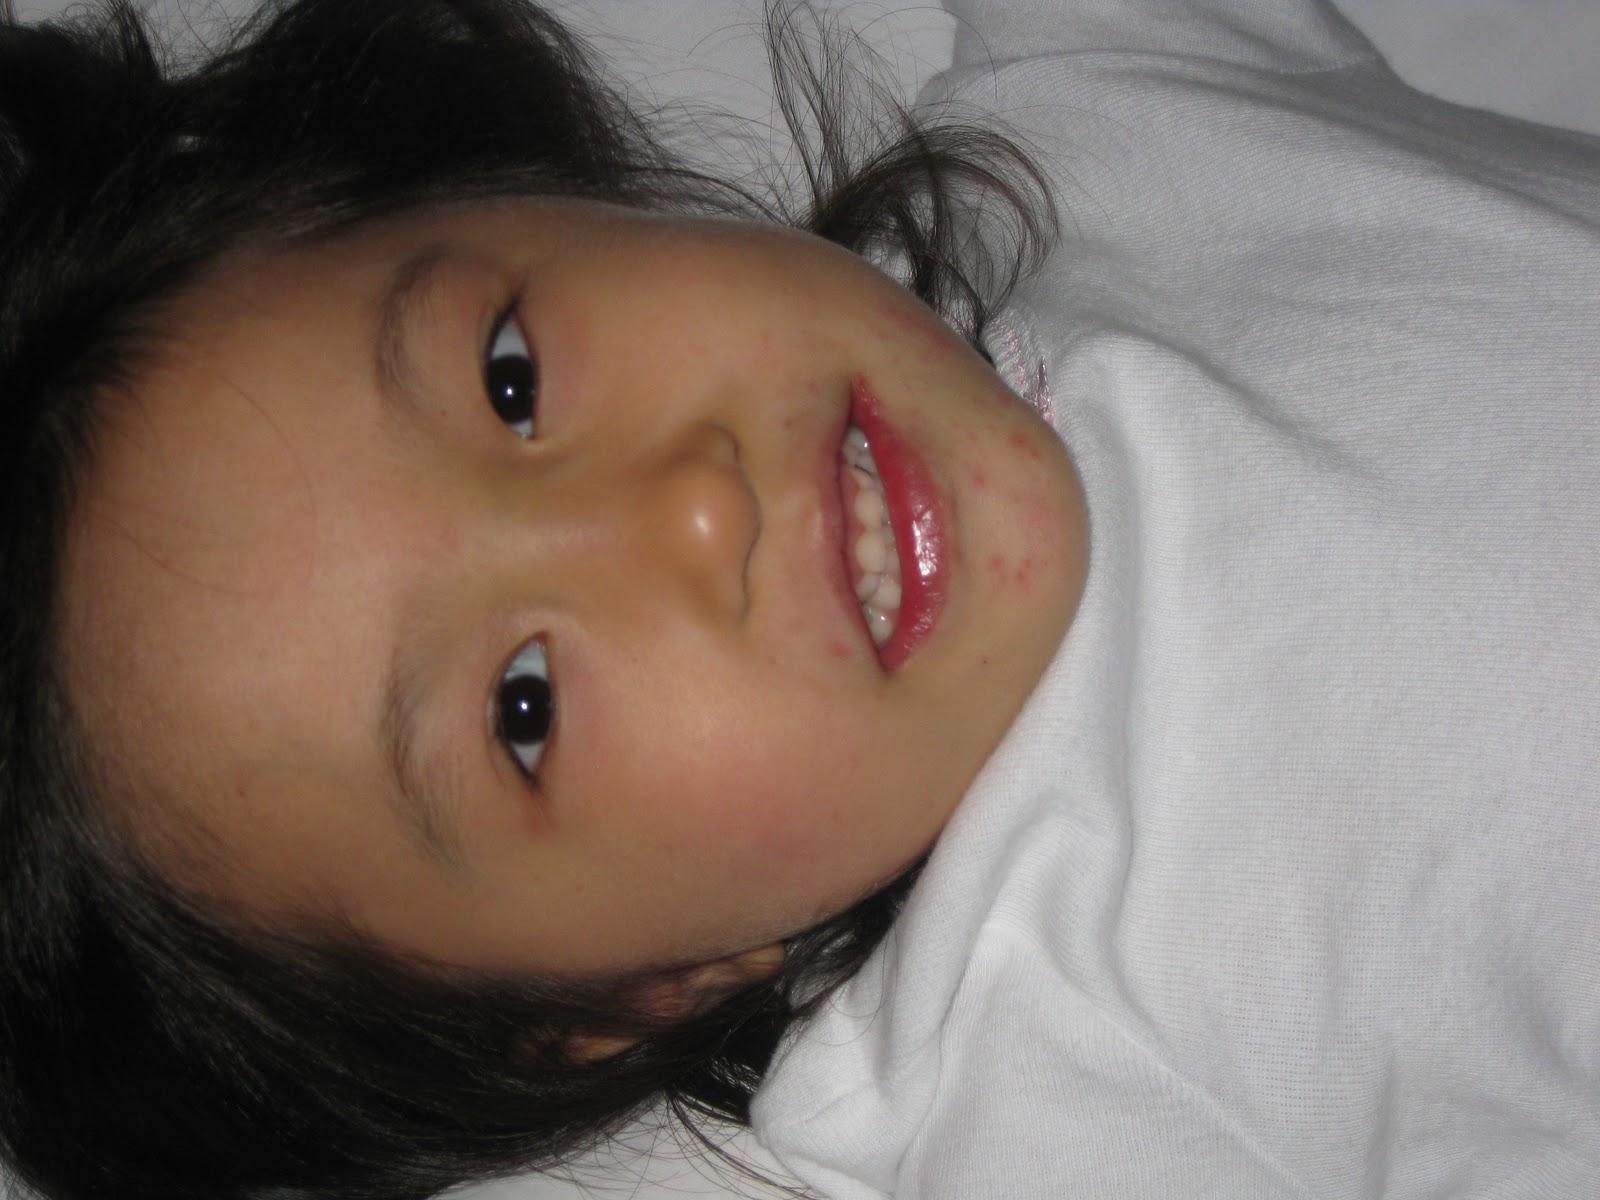 http://1.bp.blogspot.com/_bvIq3s9oxIs/TLRCp4jRDNI/AAAAAAAAAXE/75XKvNLwlys/s1600/happy+girl+4.JPG